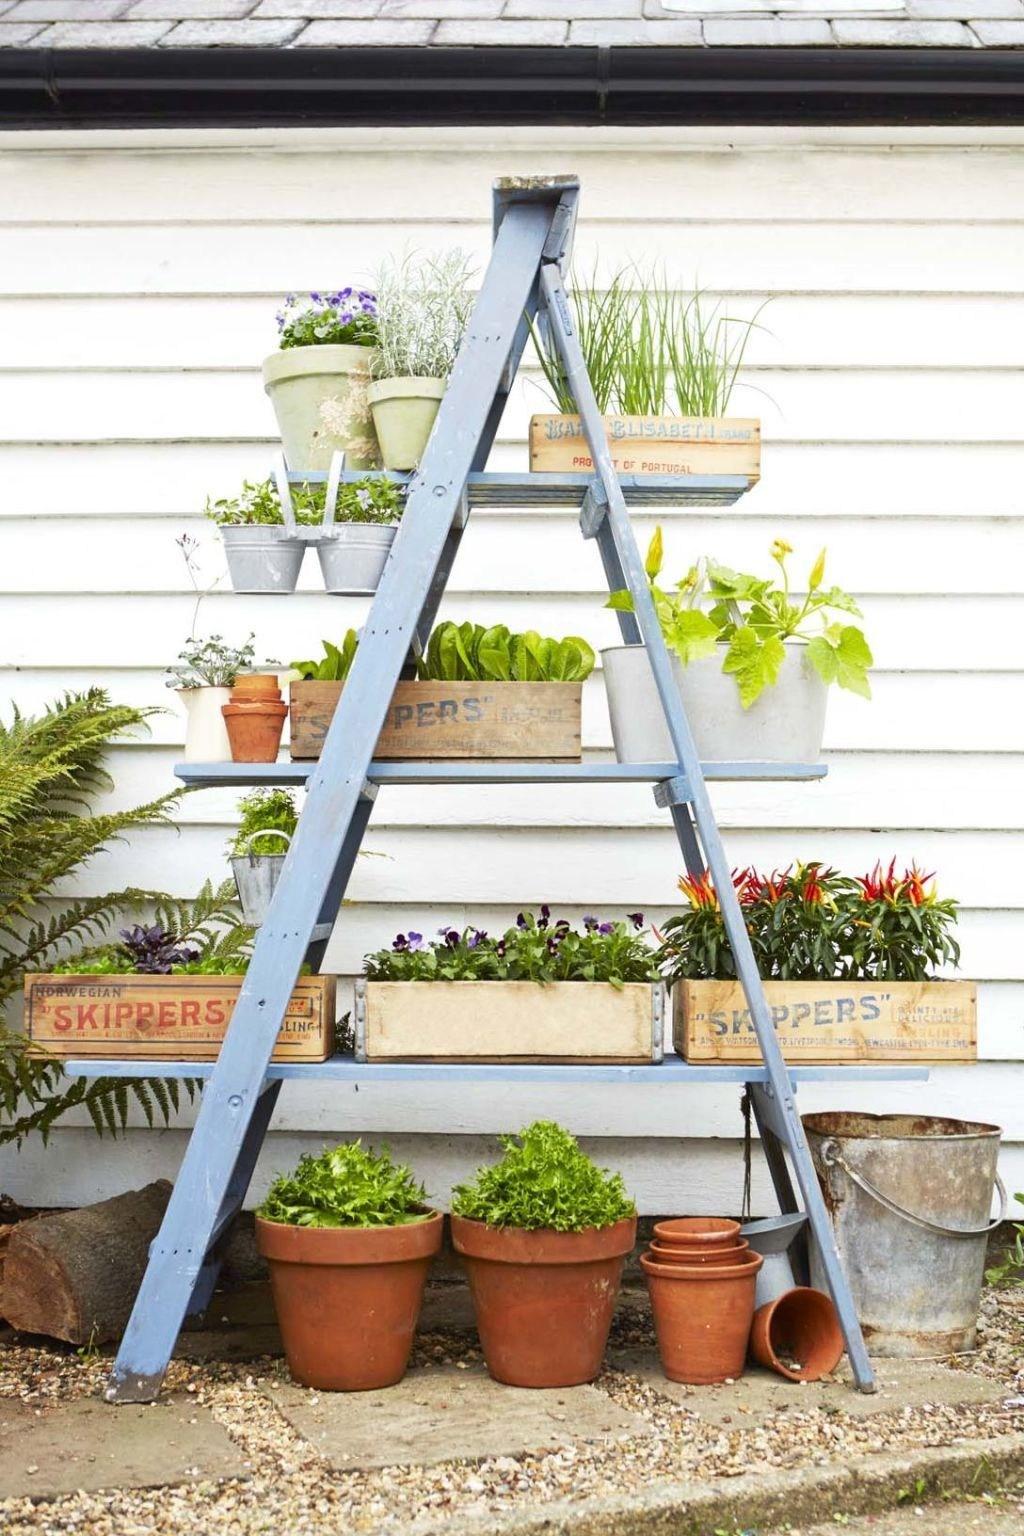 16 Container Gardening Ideas Potted Plant Ideas We Love   Outdoor Garden Under Stairs   Exterior   Walkway   Crosstie   Gardening   Simple